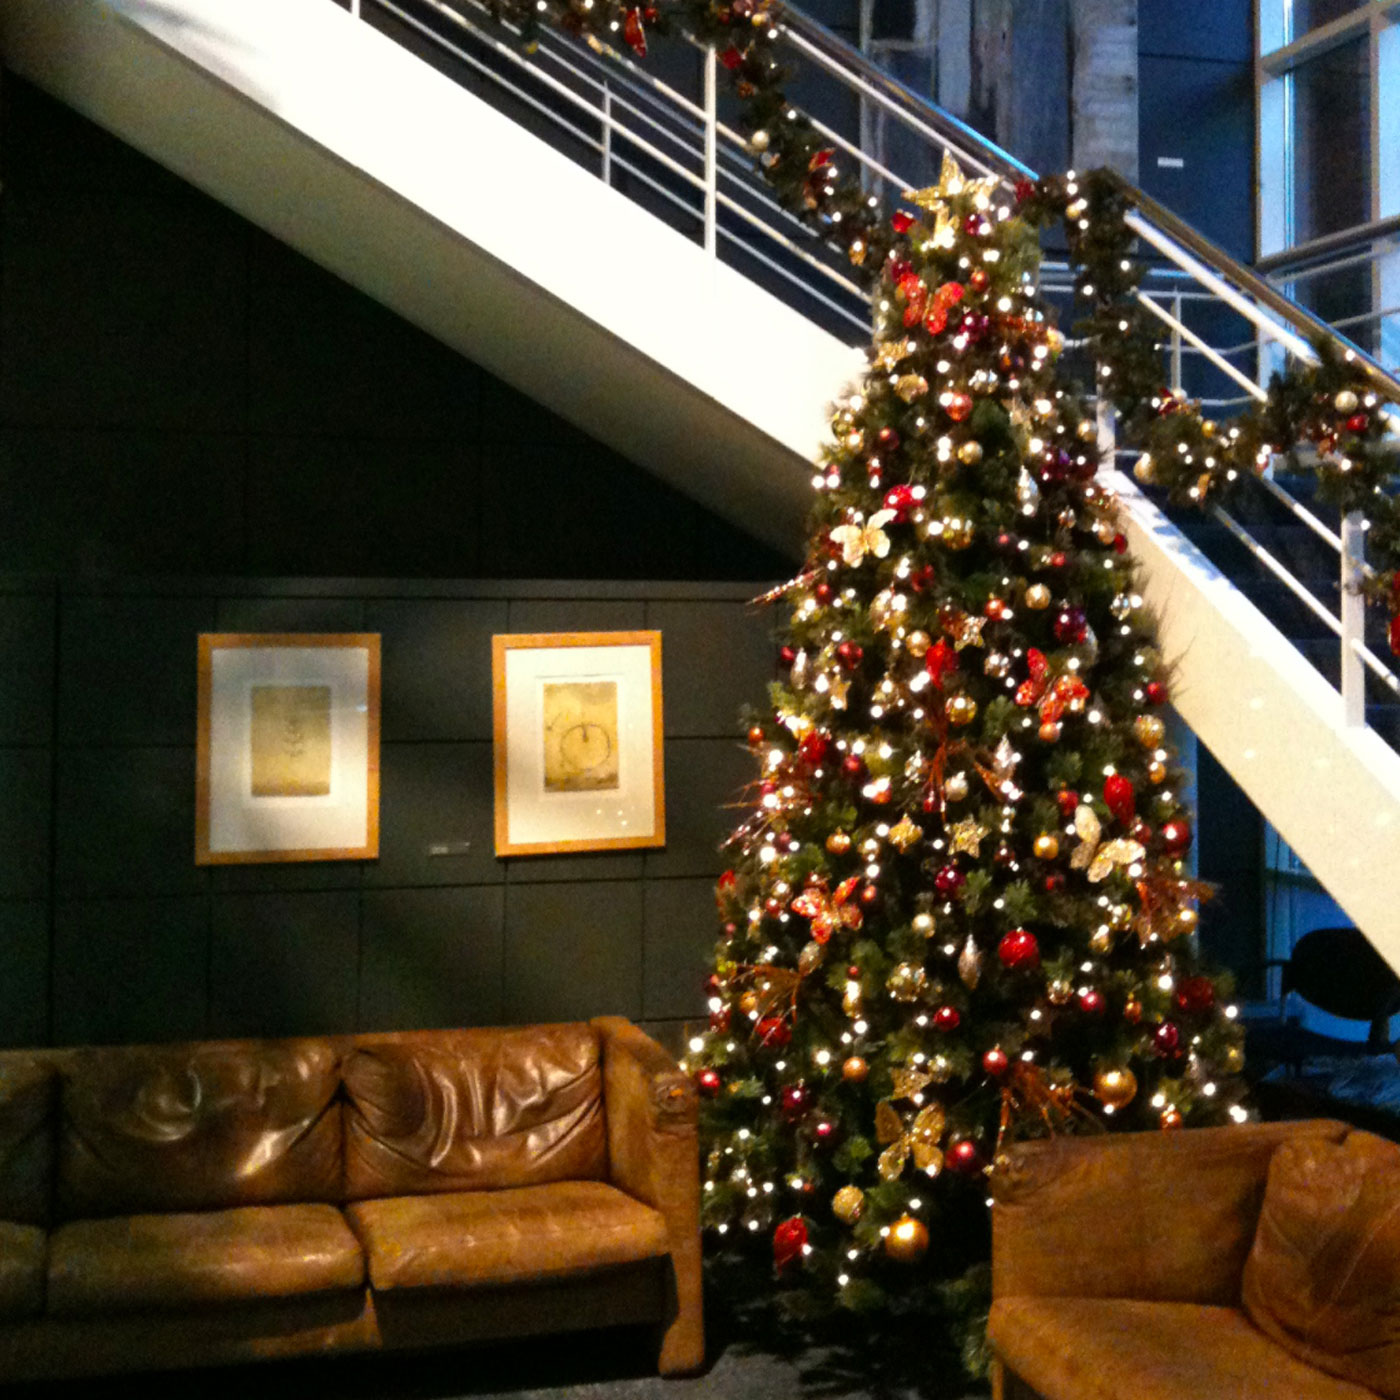 Christmas-Decorations-4